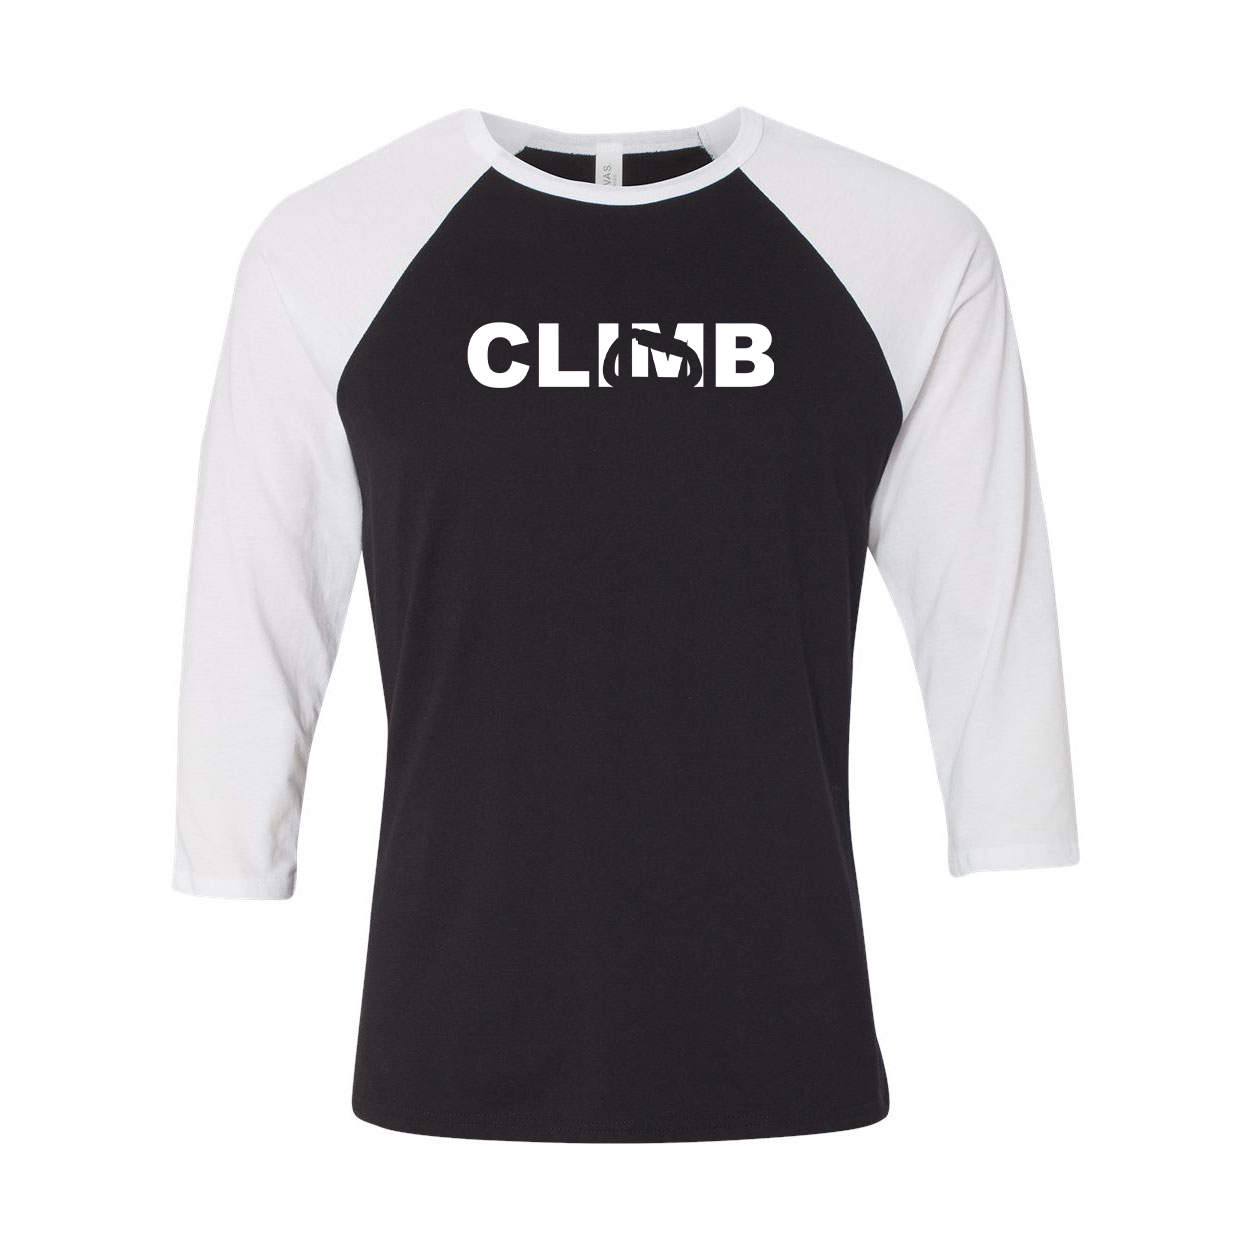 Climb Carabiner Logo Classic Raglan Shirt Black/White (White Logo)